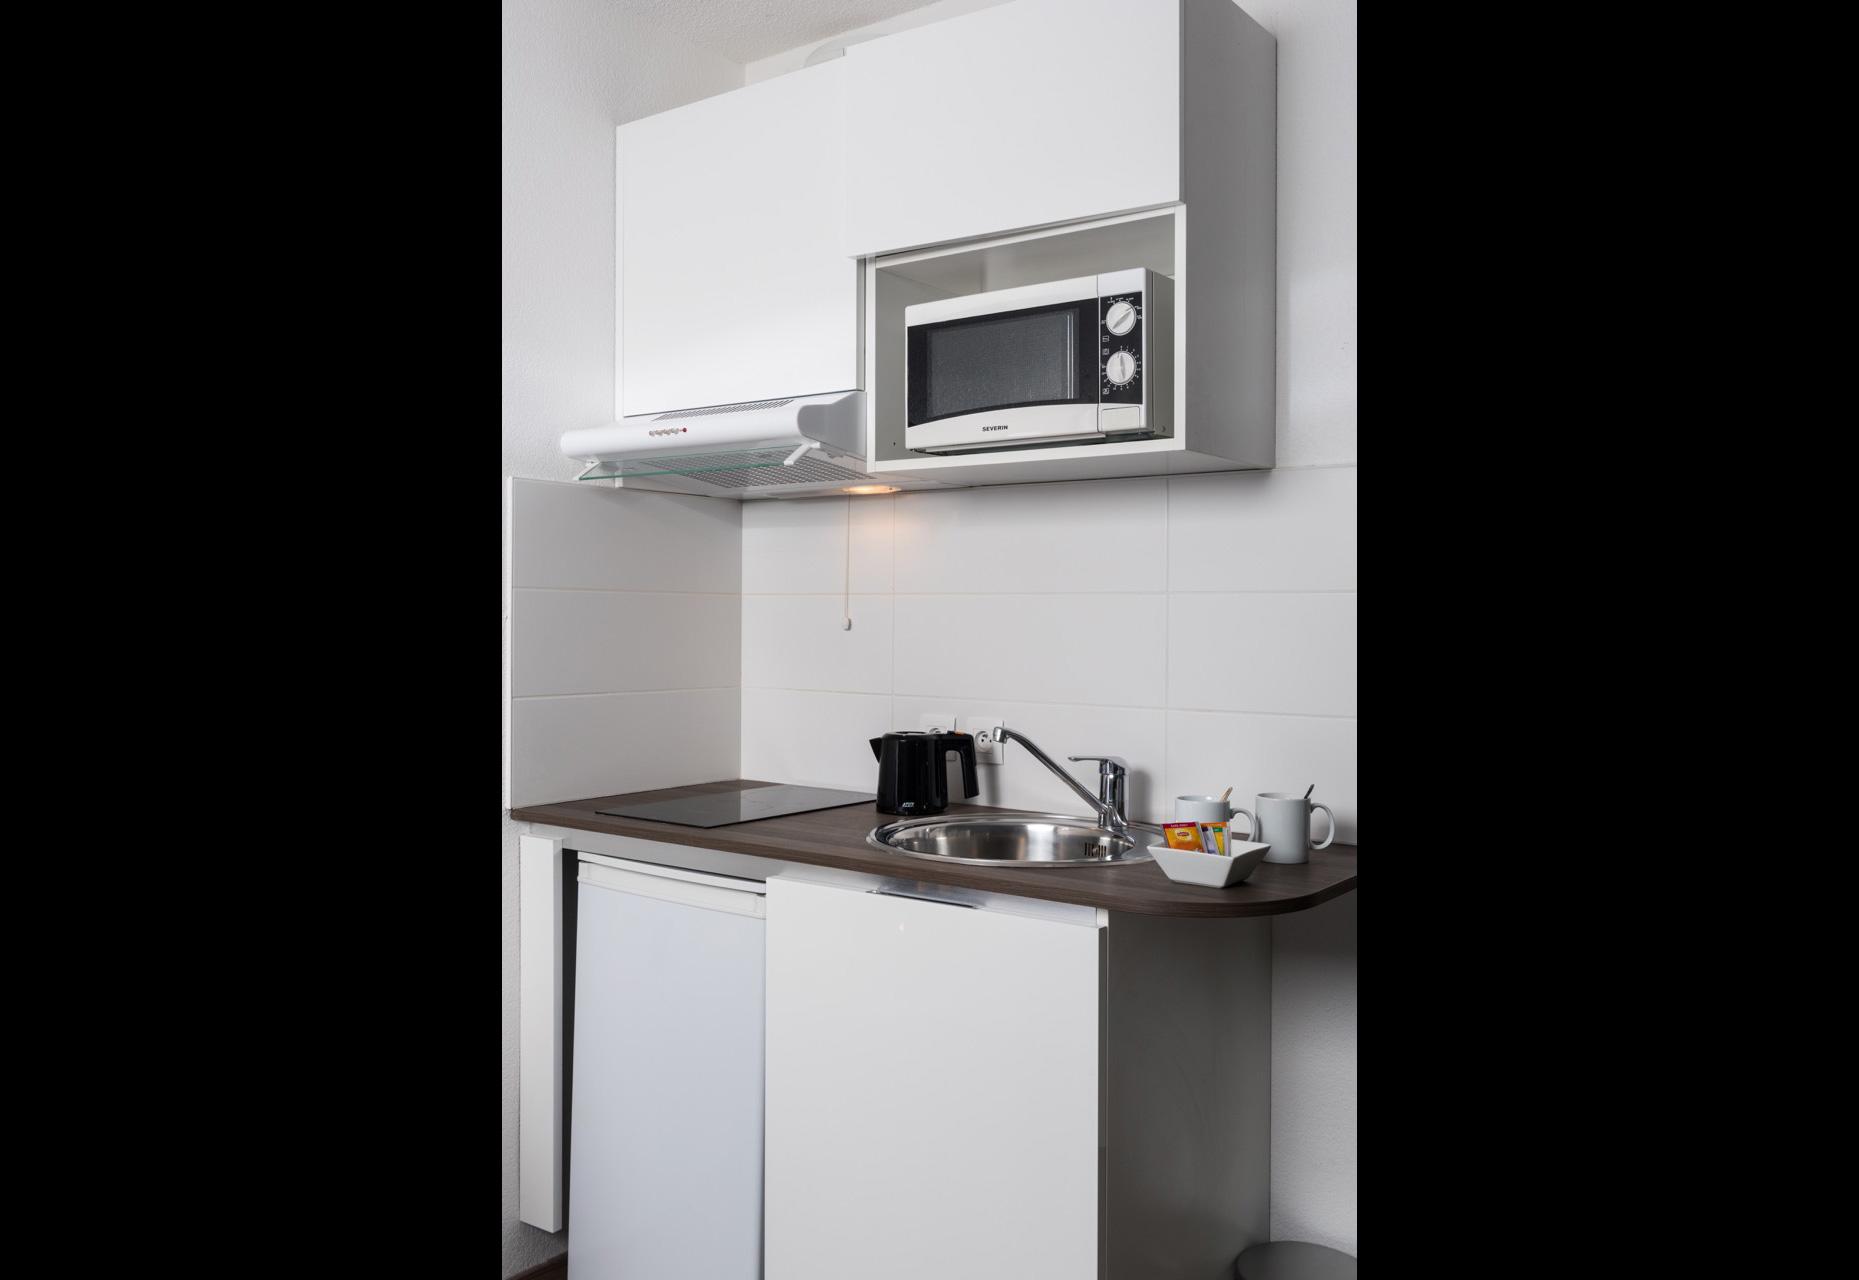 hygena merignac cheap promos de chantemur dans le prospectus mrignac gironde with hygena. Black Bedroom Furniture Sets. Home Design Ideas